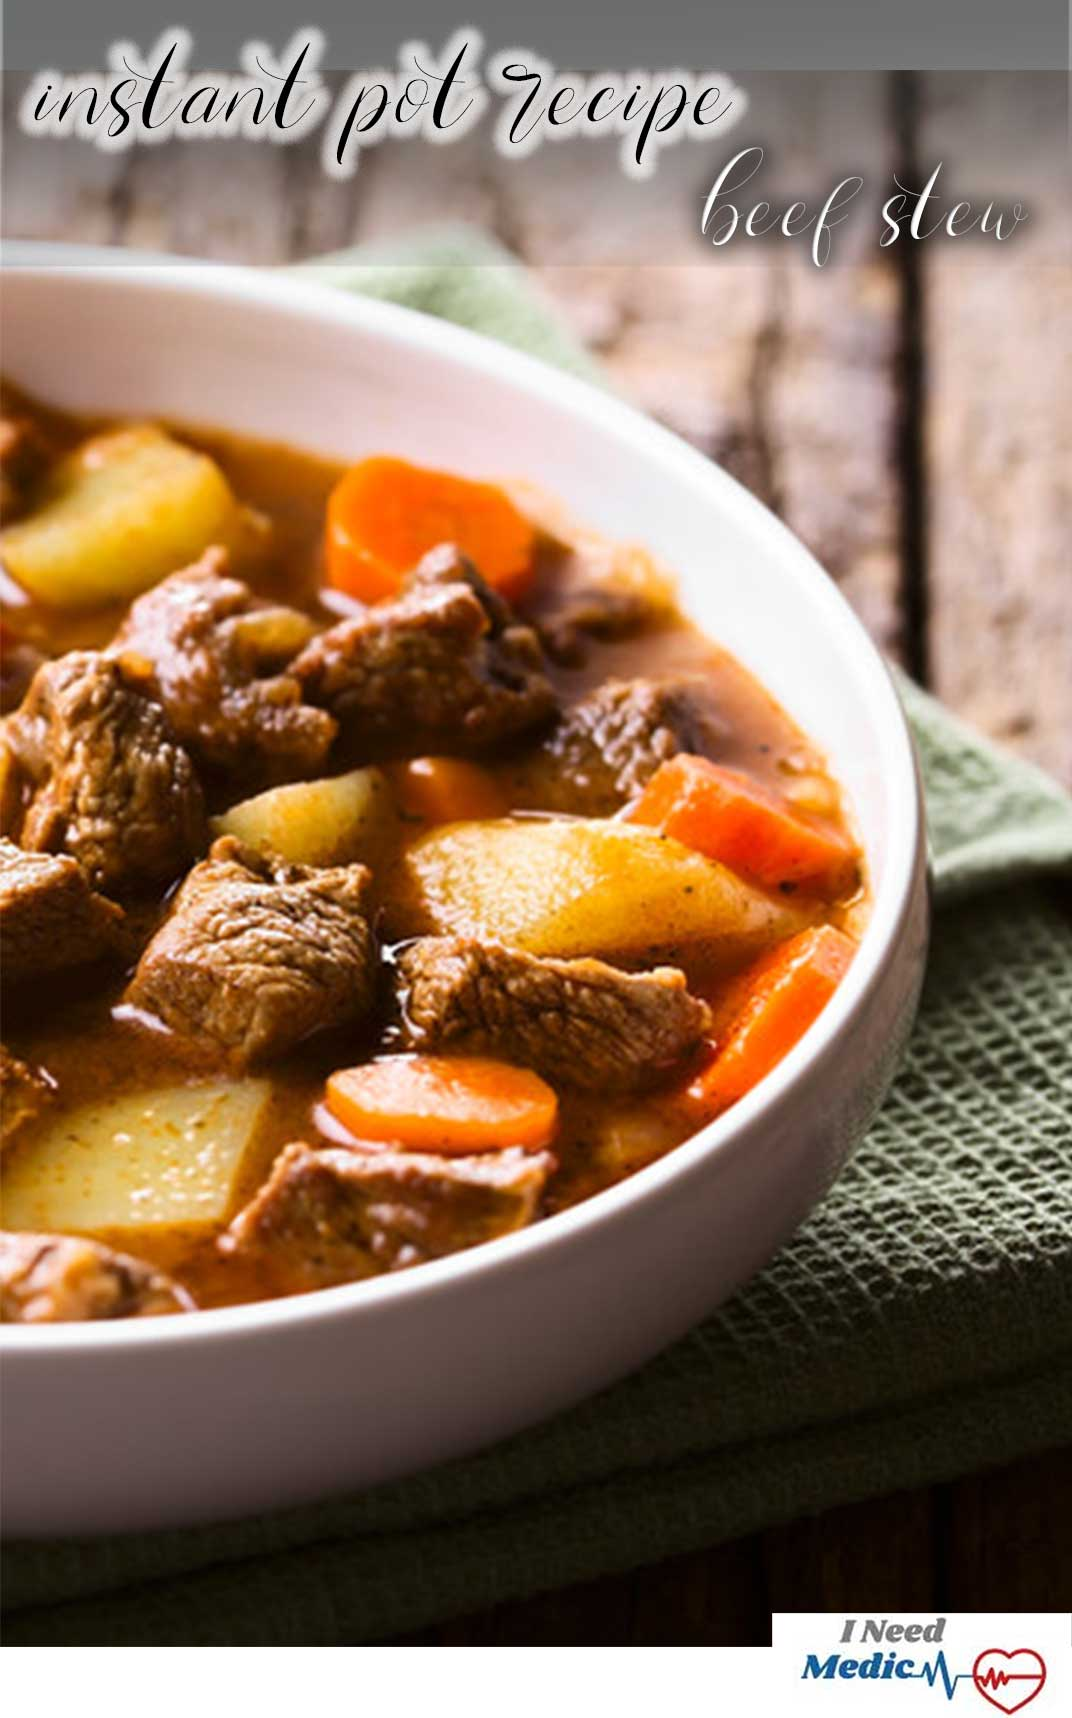 beef stew recipe, instant pot recipes